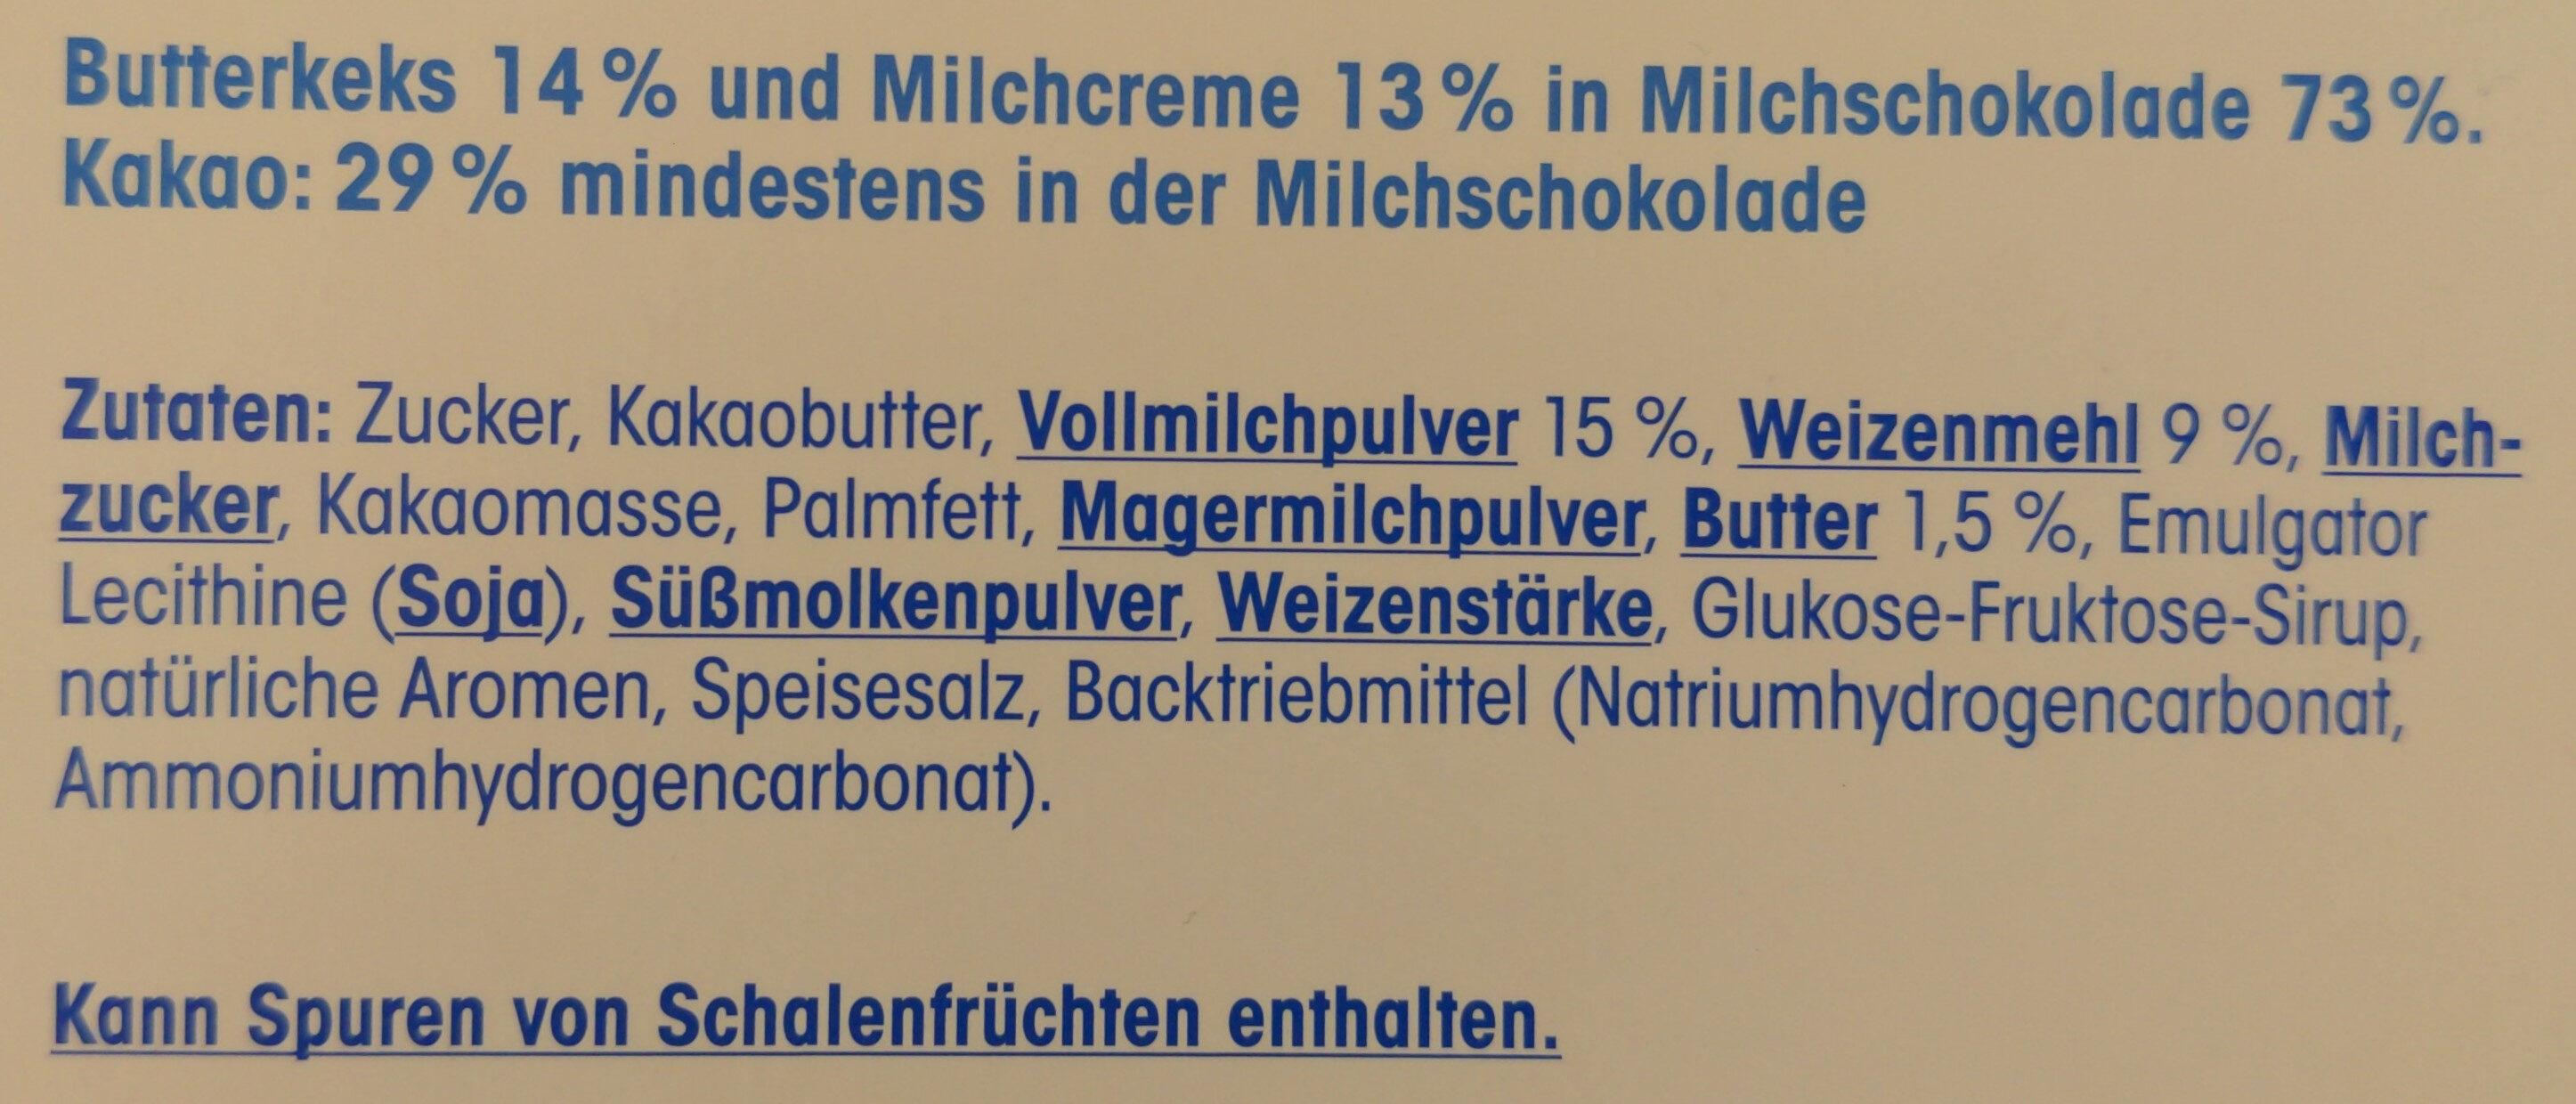 Schoko & Keks mit Milchcreme - Ingredients - de